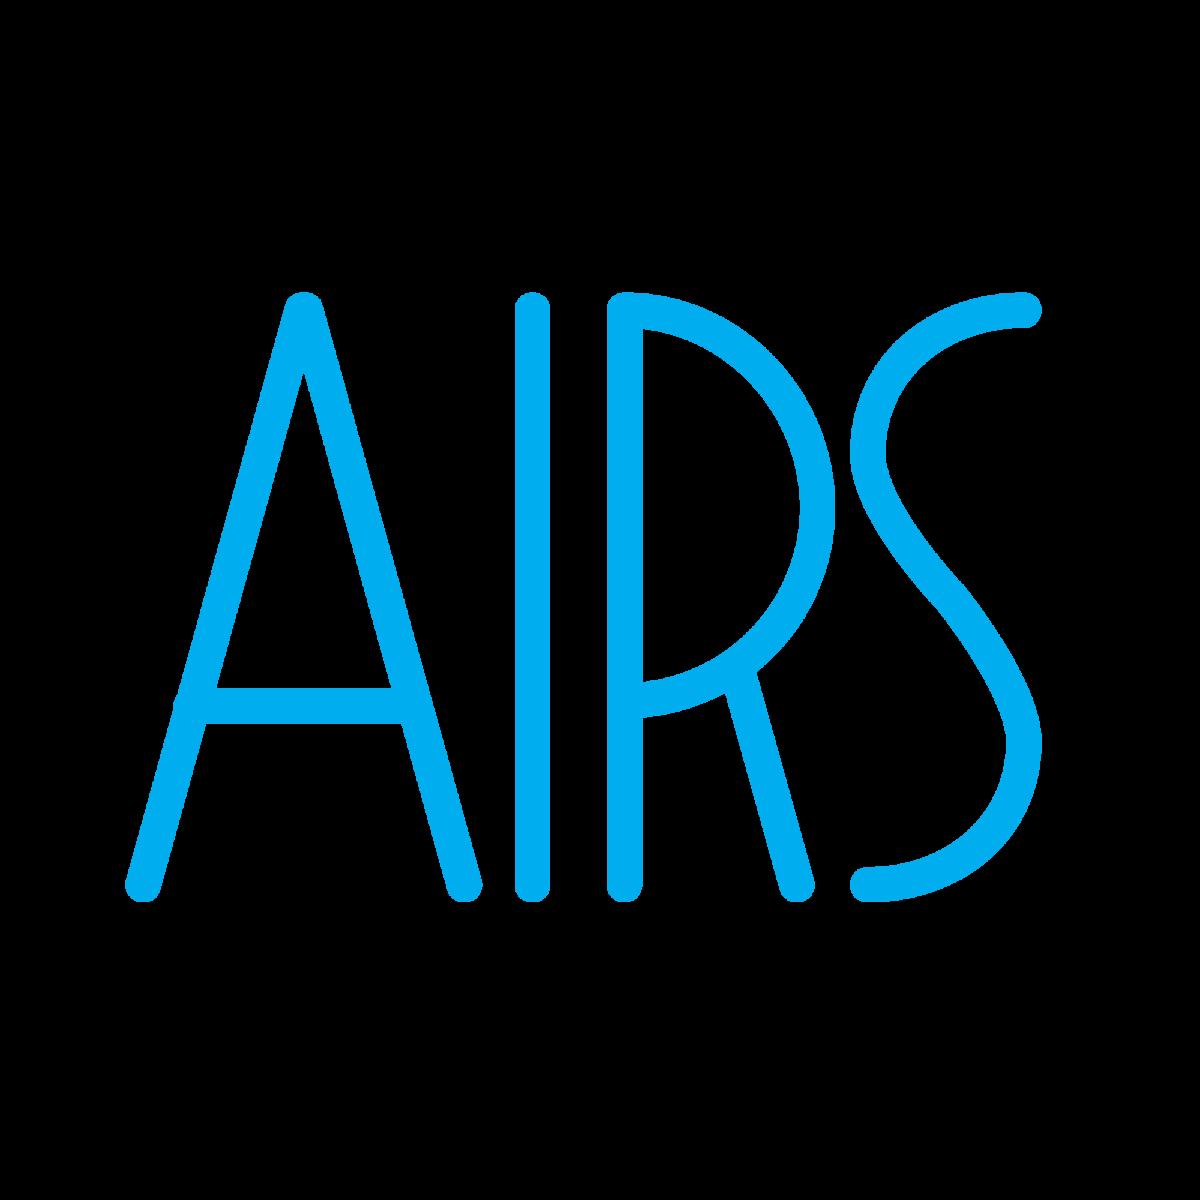 AIRS Program - Icons